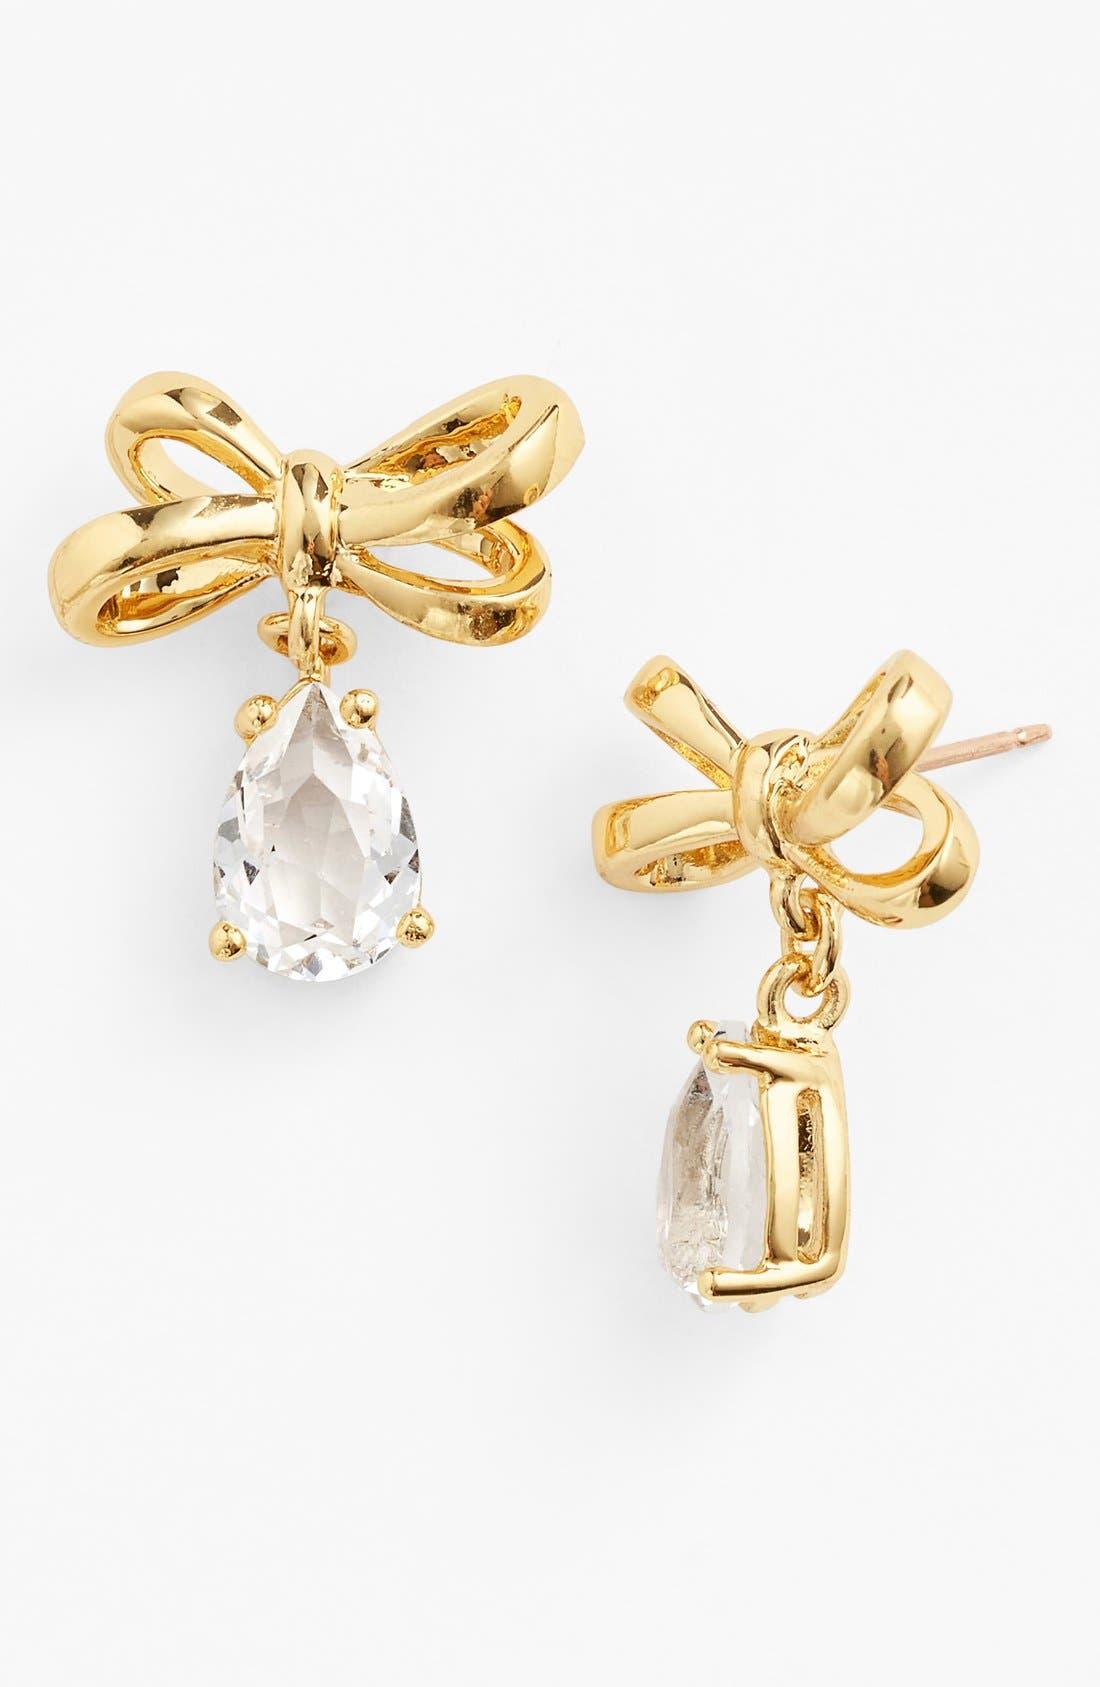 Main Image - kate spade new york 'tied up' drop earrings